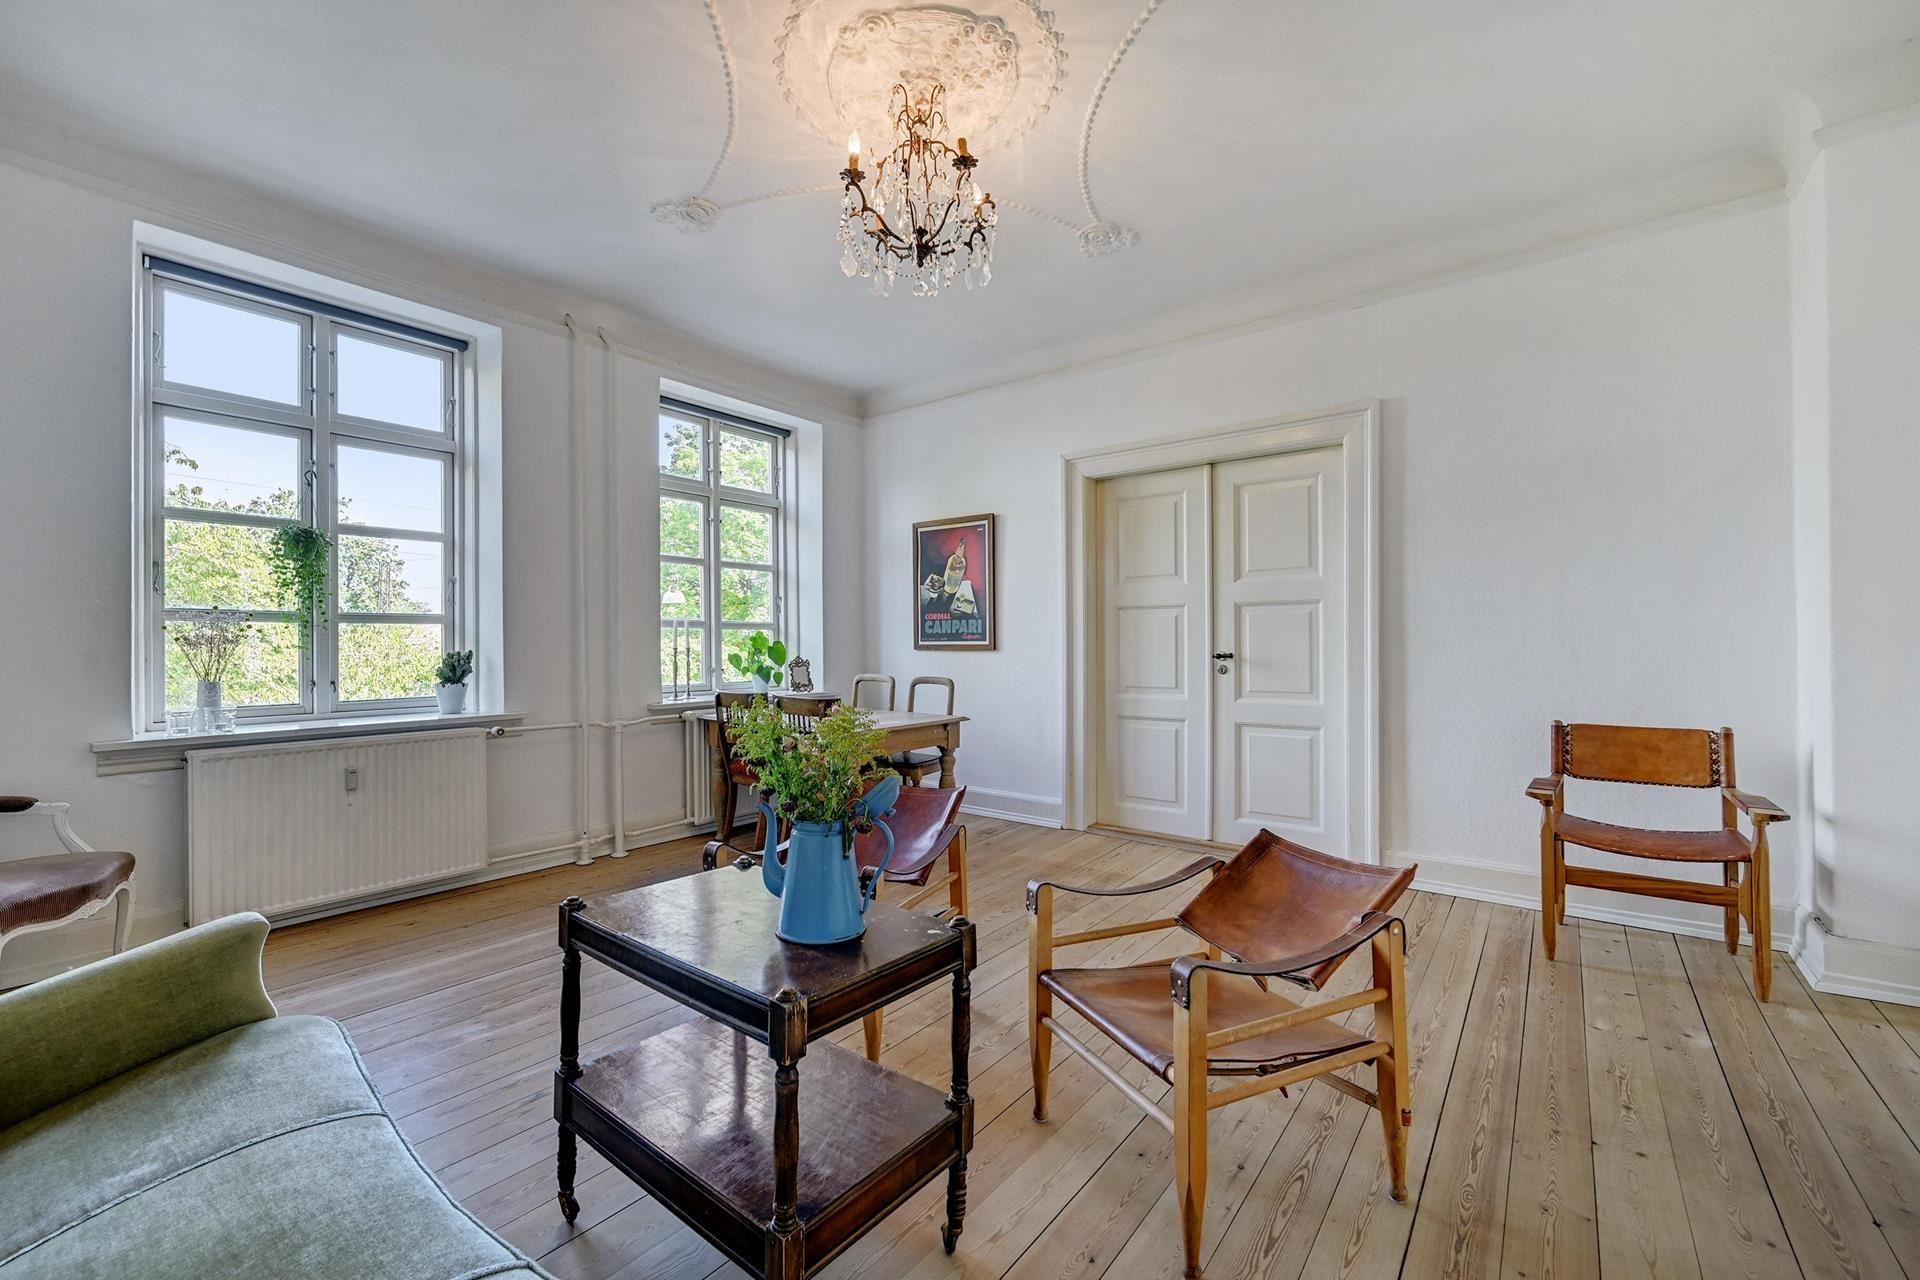 Christiansgade 8, 1., 8000 Aarhus C